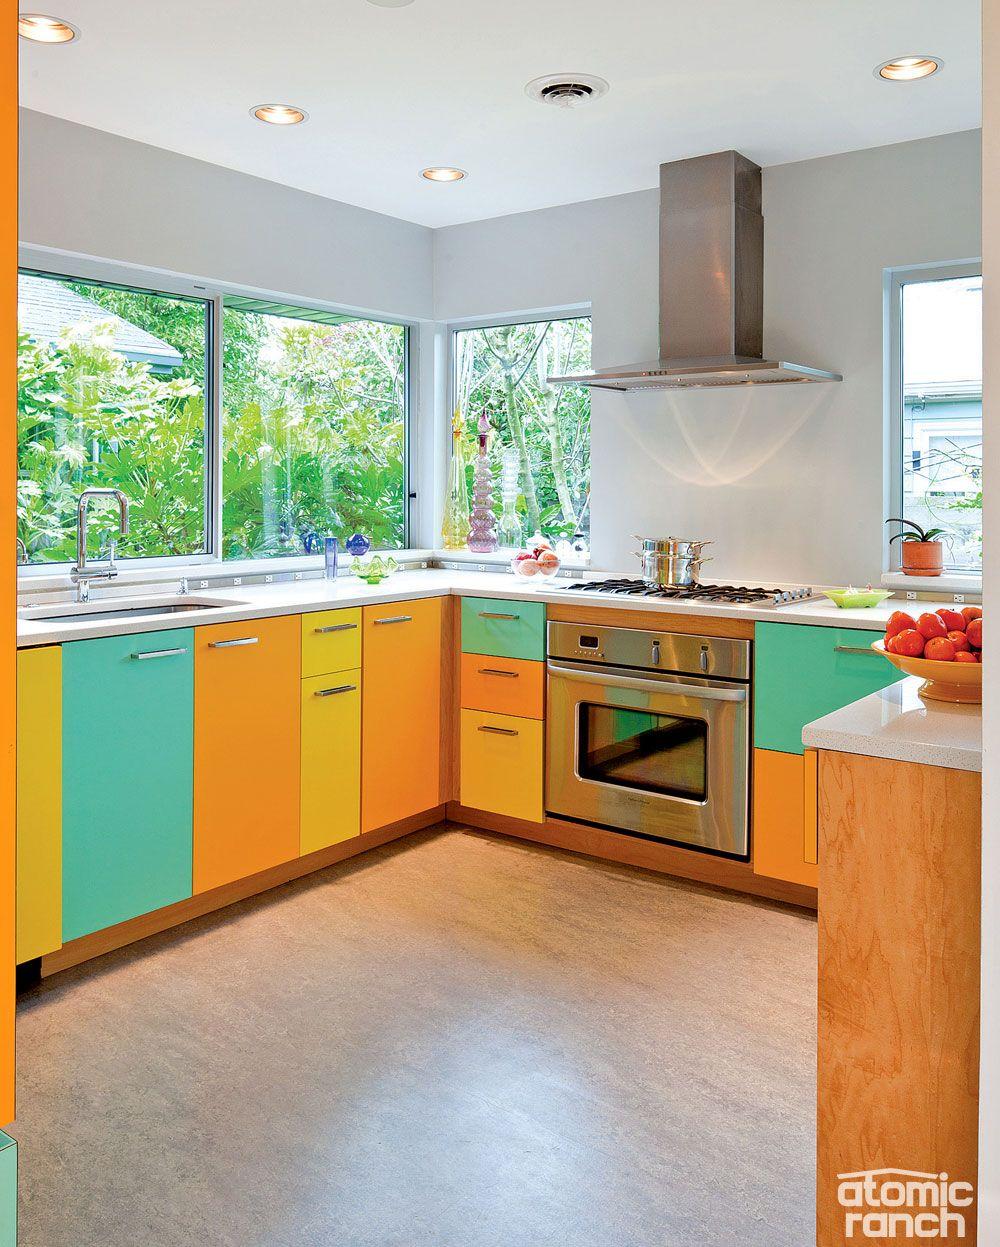 27 Brilliant Small Kitchen Design Ideas: That's Brilliant, Pt. 3: A Last-Minute Atomic Kitchen Renovation